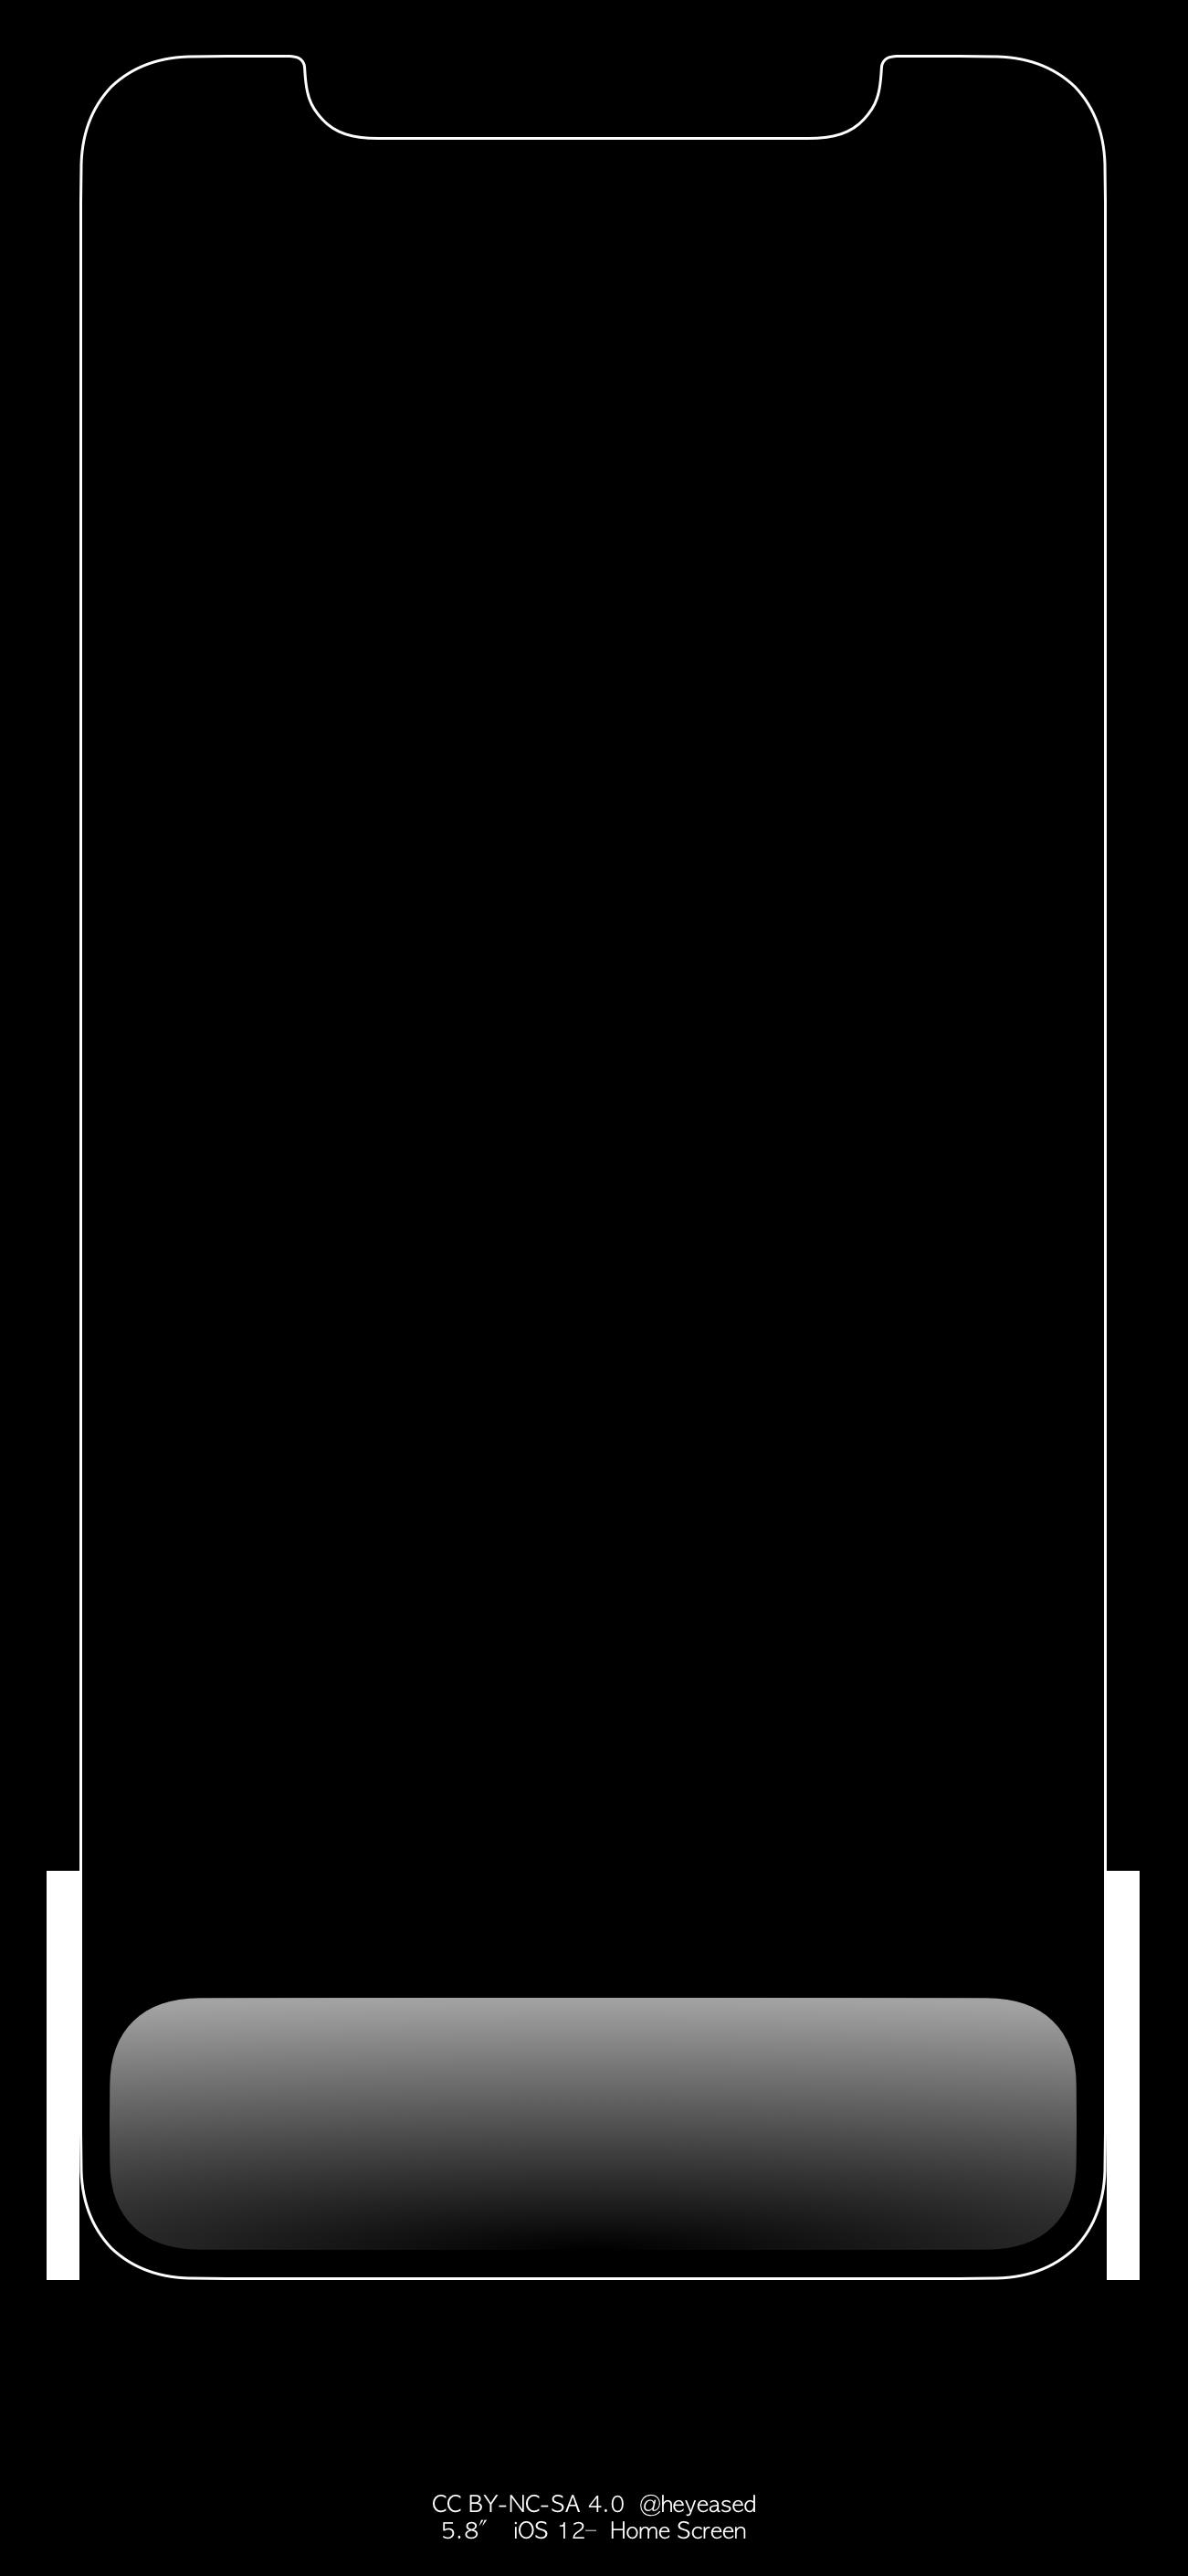 iphone x和xs炫彩dock栏壁纸大全 苹果iphone x/xs发光壁纸高清